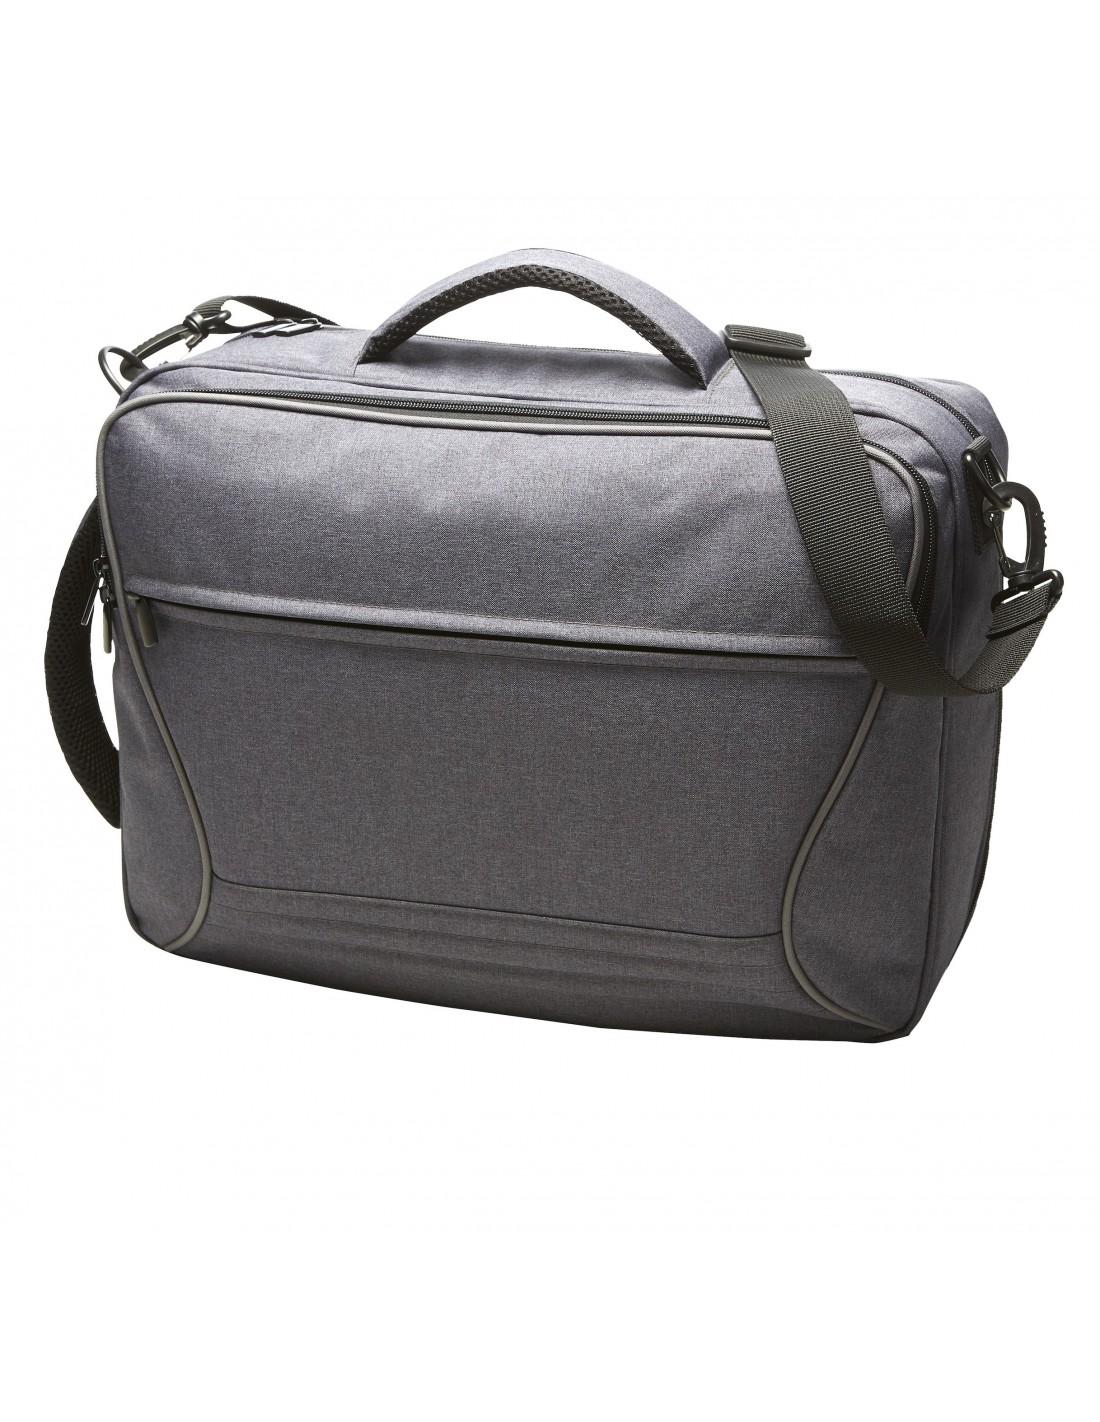 5c2e8a86fb0ab Torba na laptopa lub plecak Halfar Attention z własnym nadrukiem